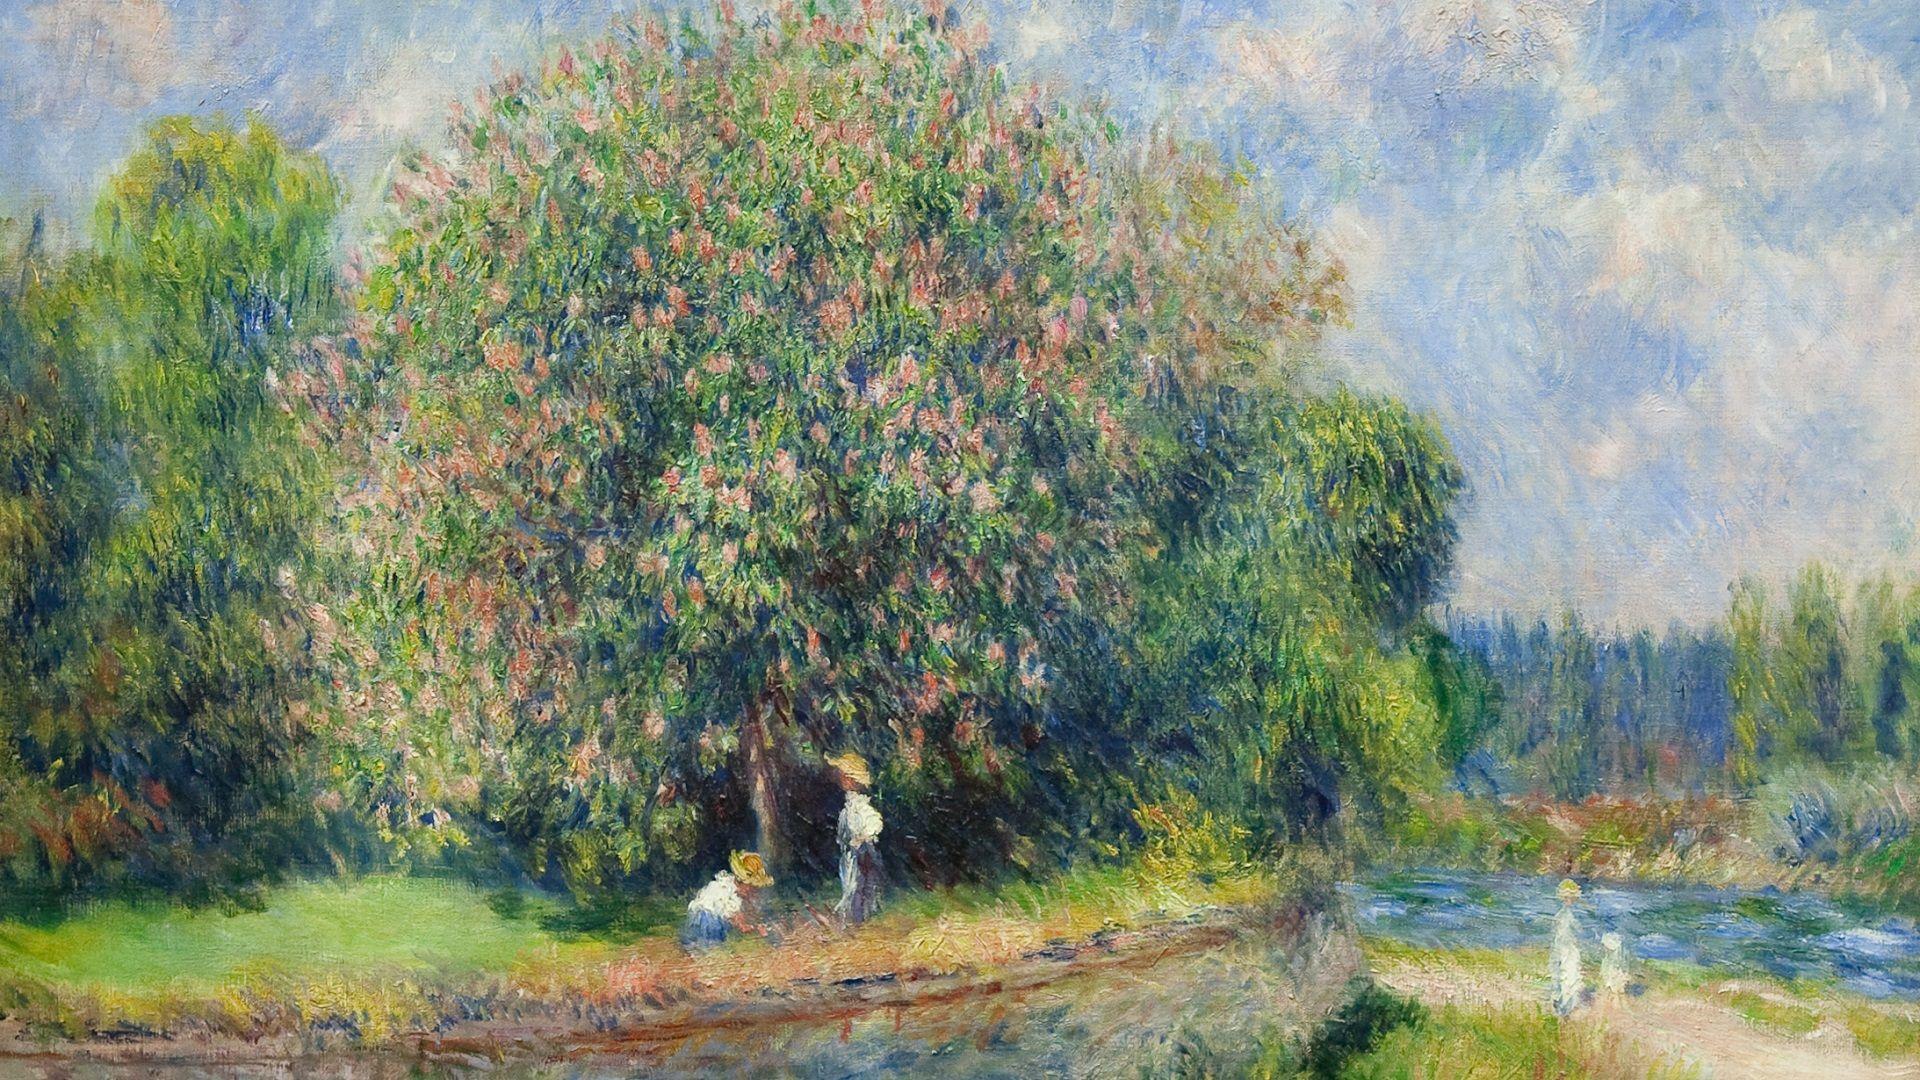 Impressionism wallpaper 1080p